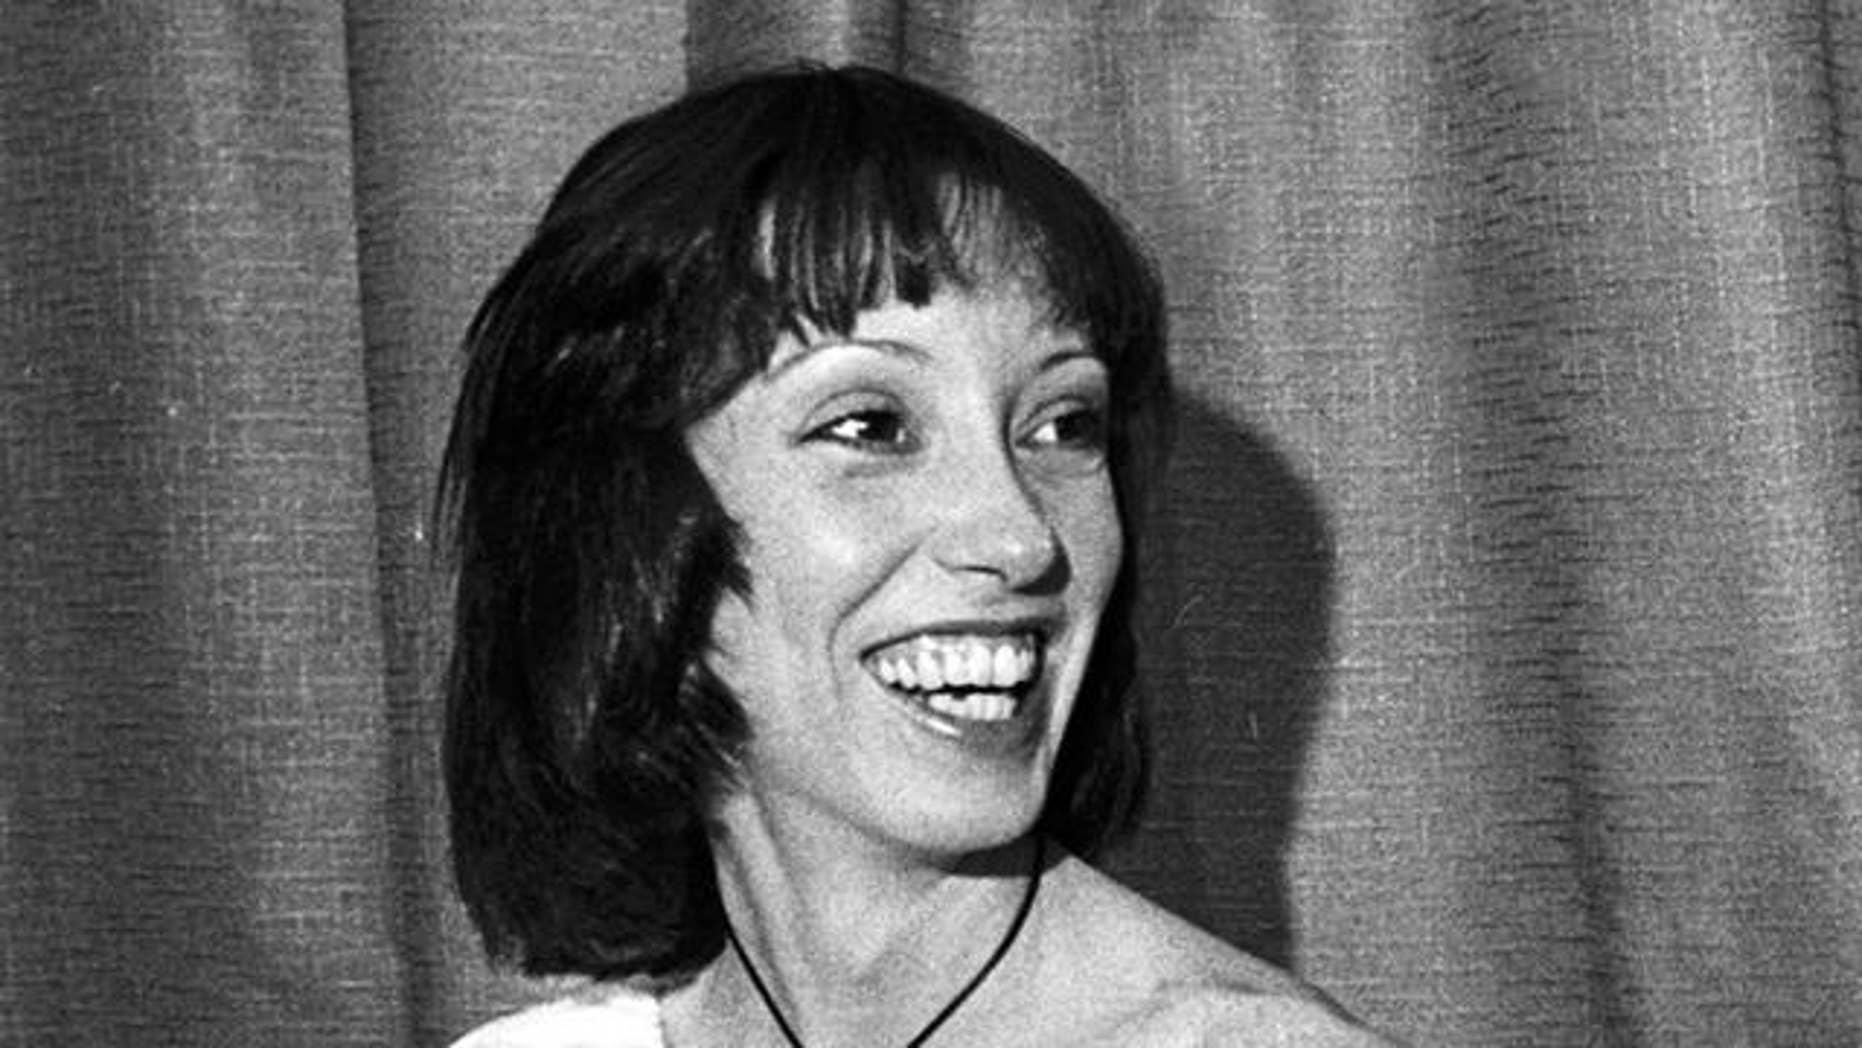 Beatrice Burnham,Paola Barale (born 1967) Porn pics & movies Pearl White,Marian Skinner